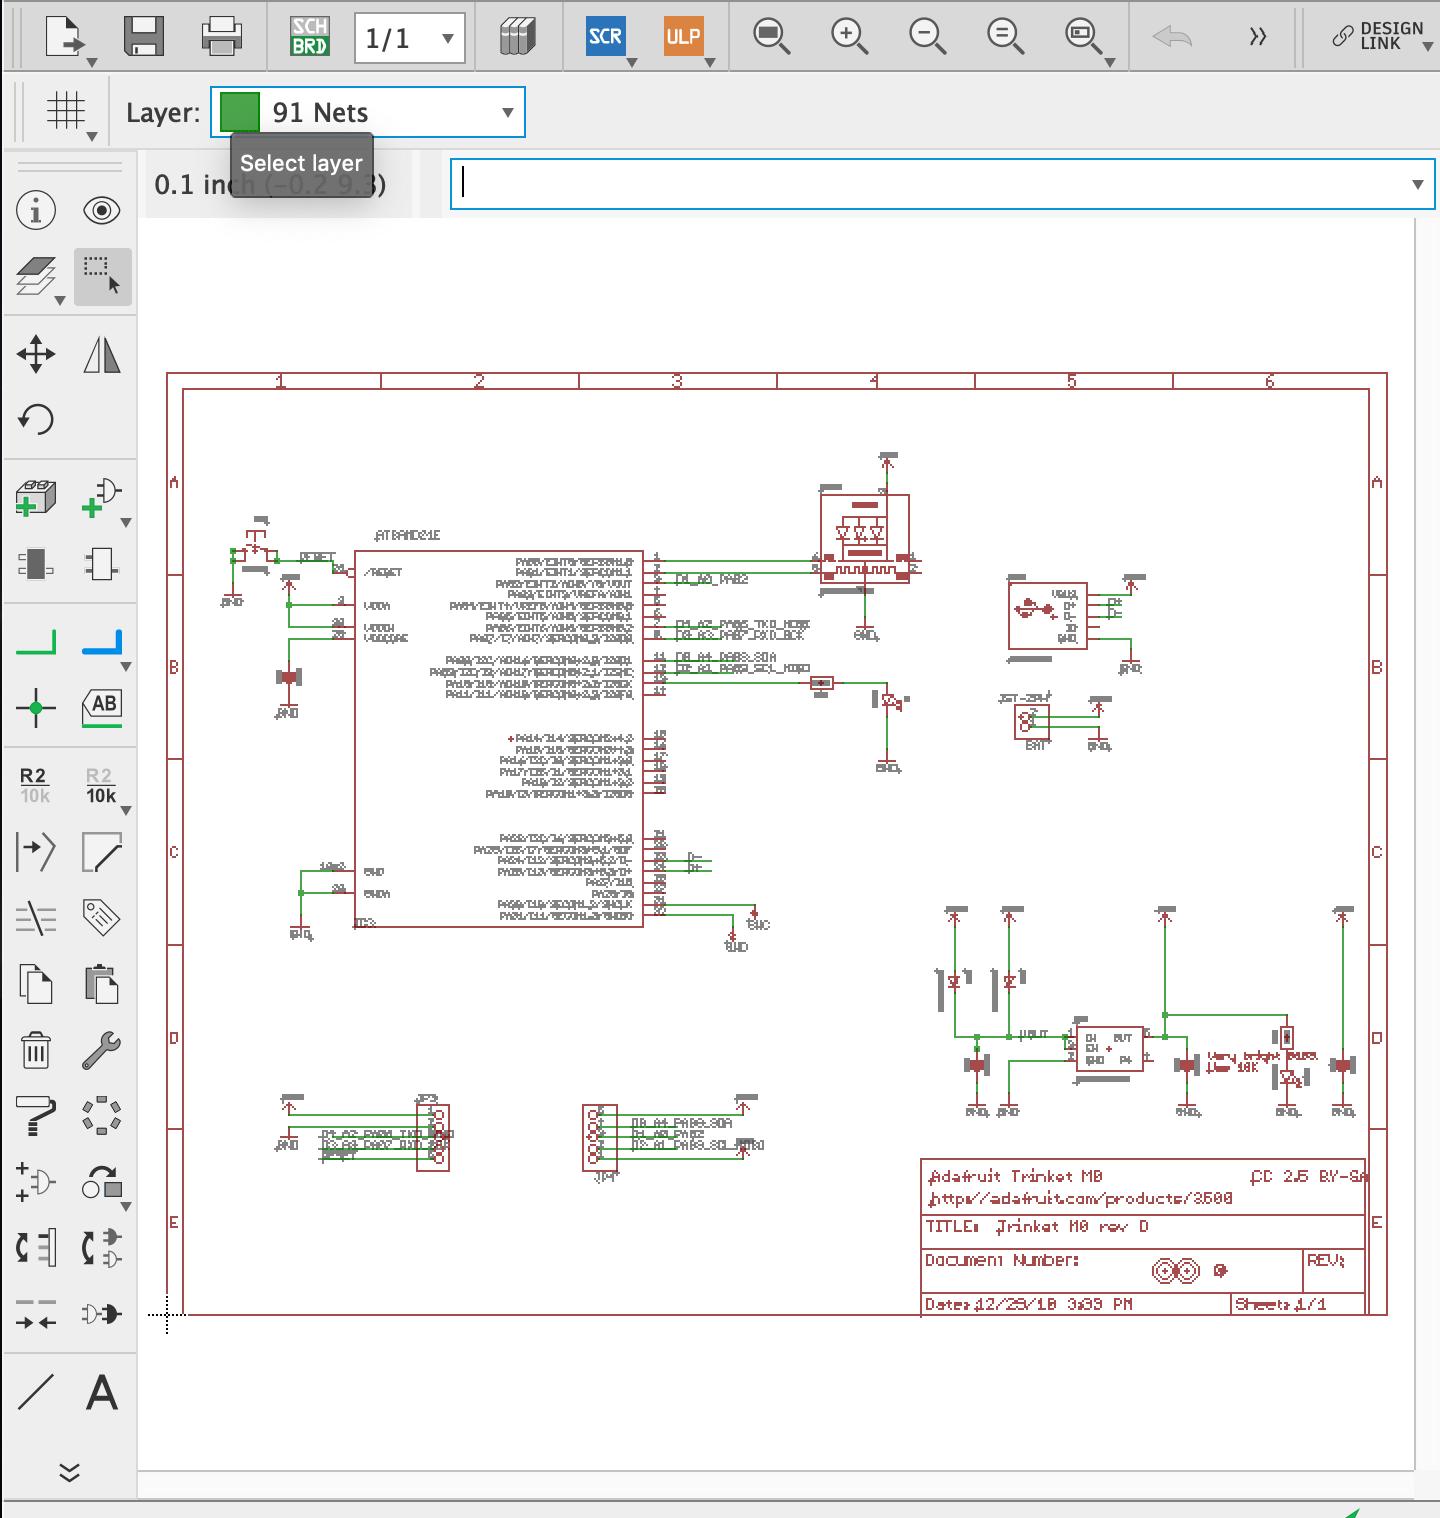 manufacturing_Screen_Shot_2018-12-31_at_3.35.41_PM.png